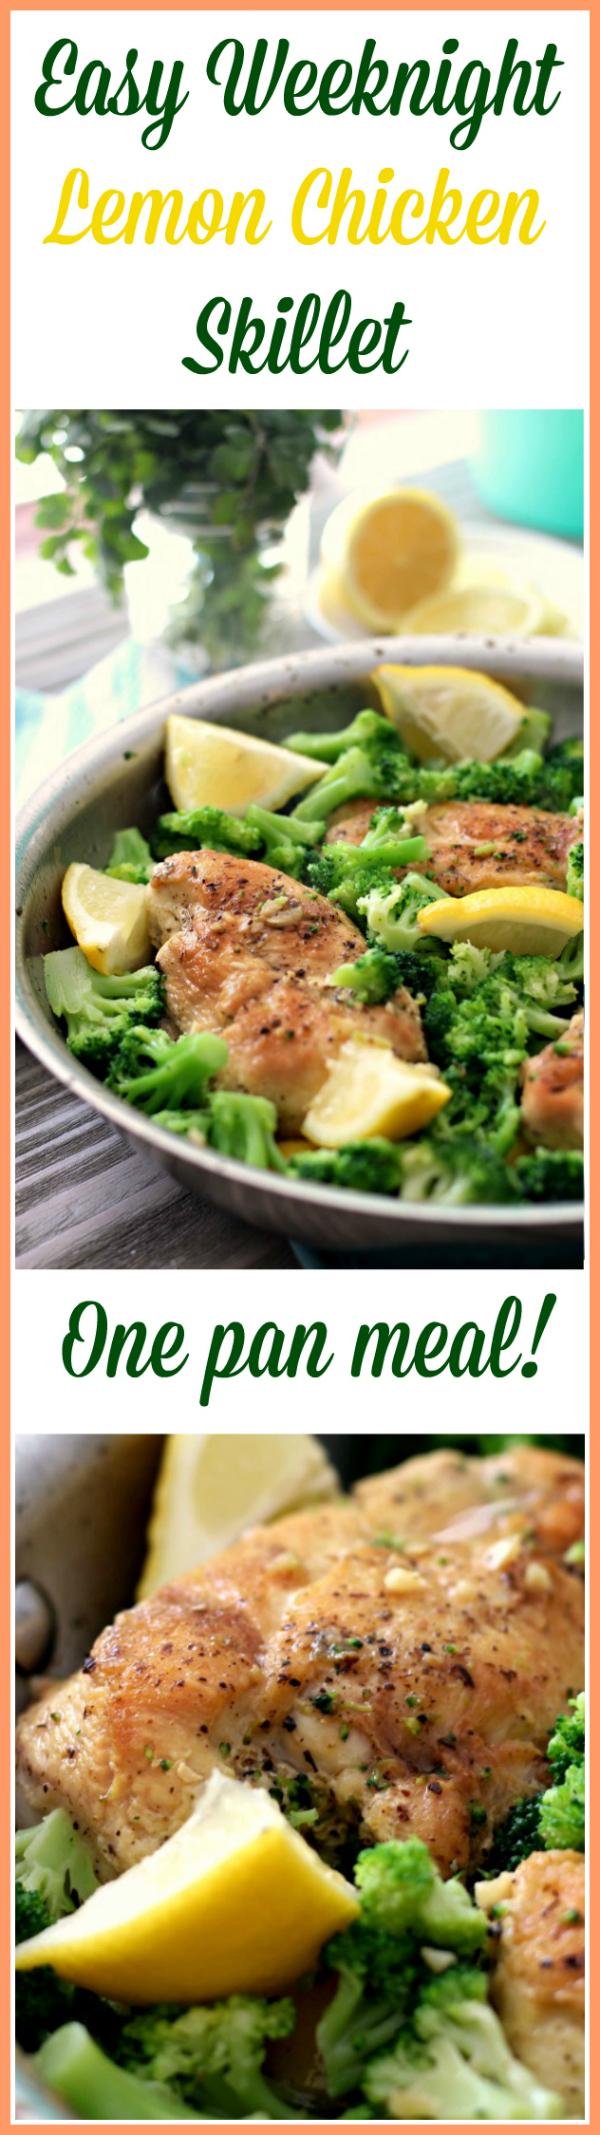 Lemon Chicken Skillet - One pan meal! Paleo, Gluten Free